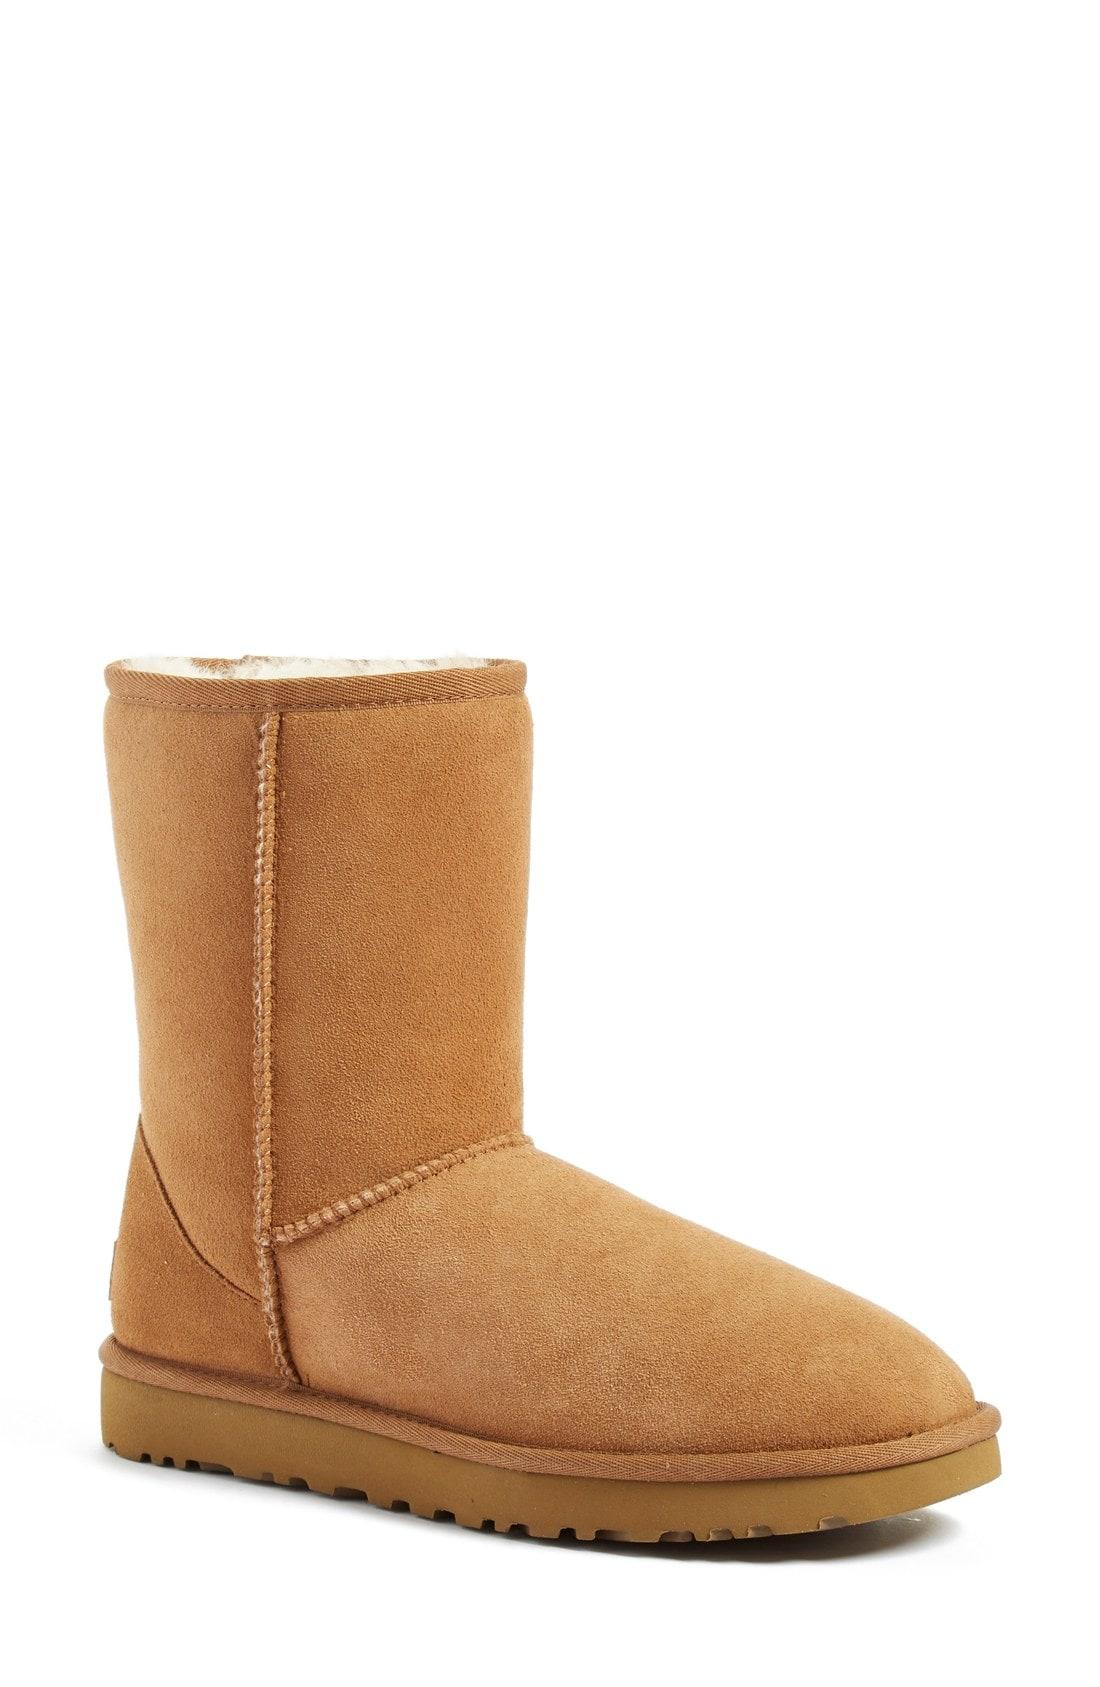 Women's Winter & Snow Boots   Nordstrom